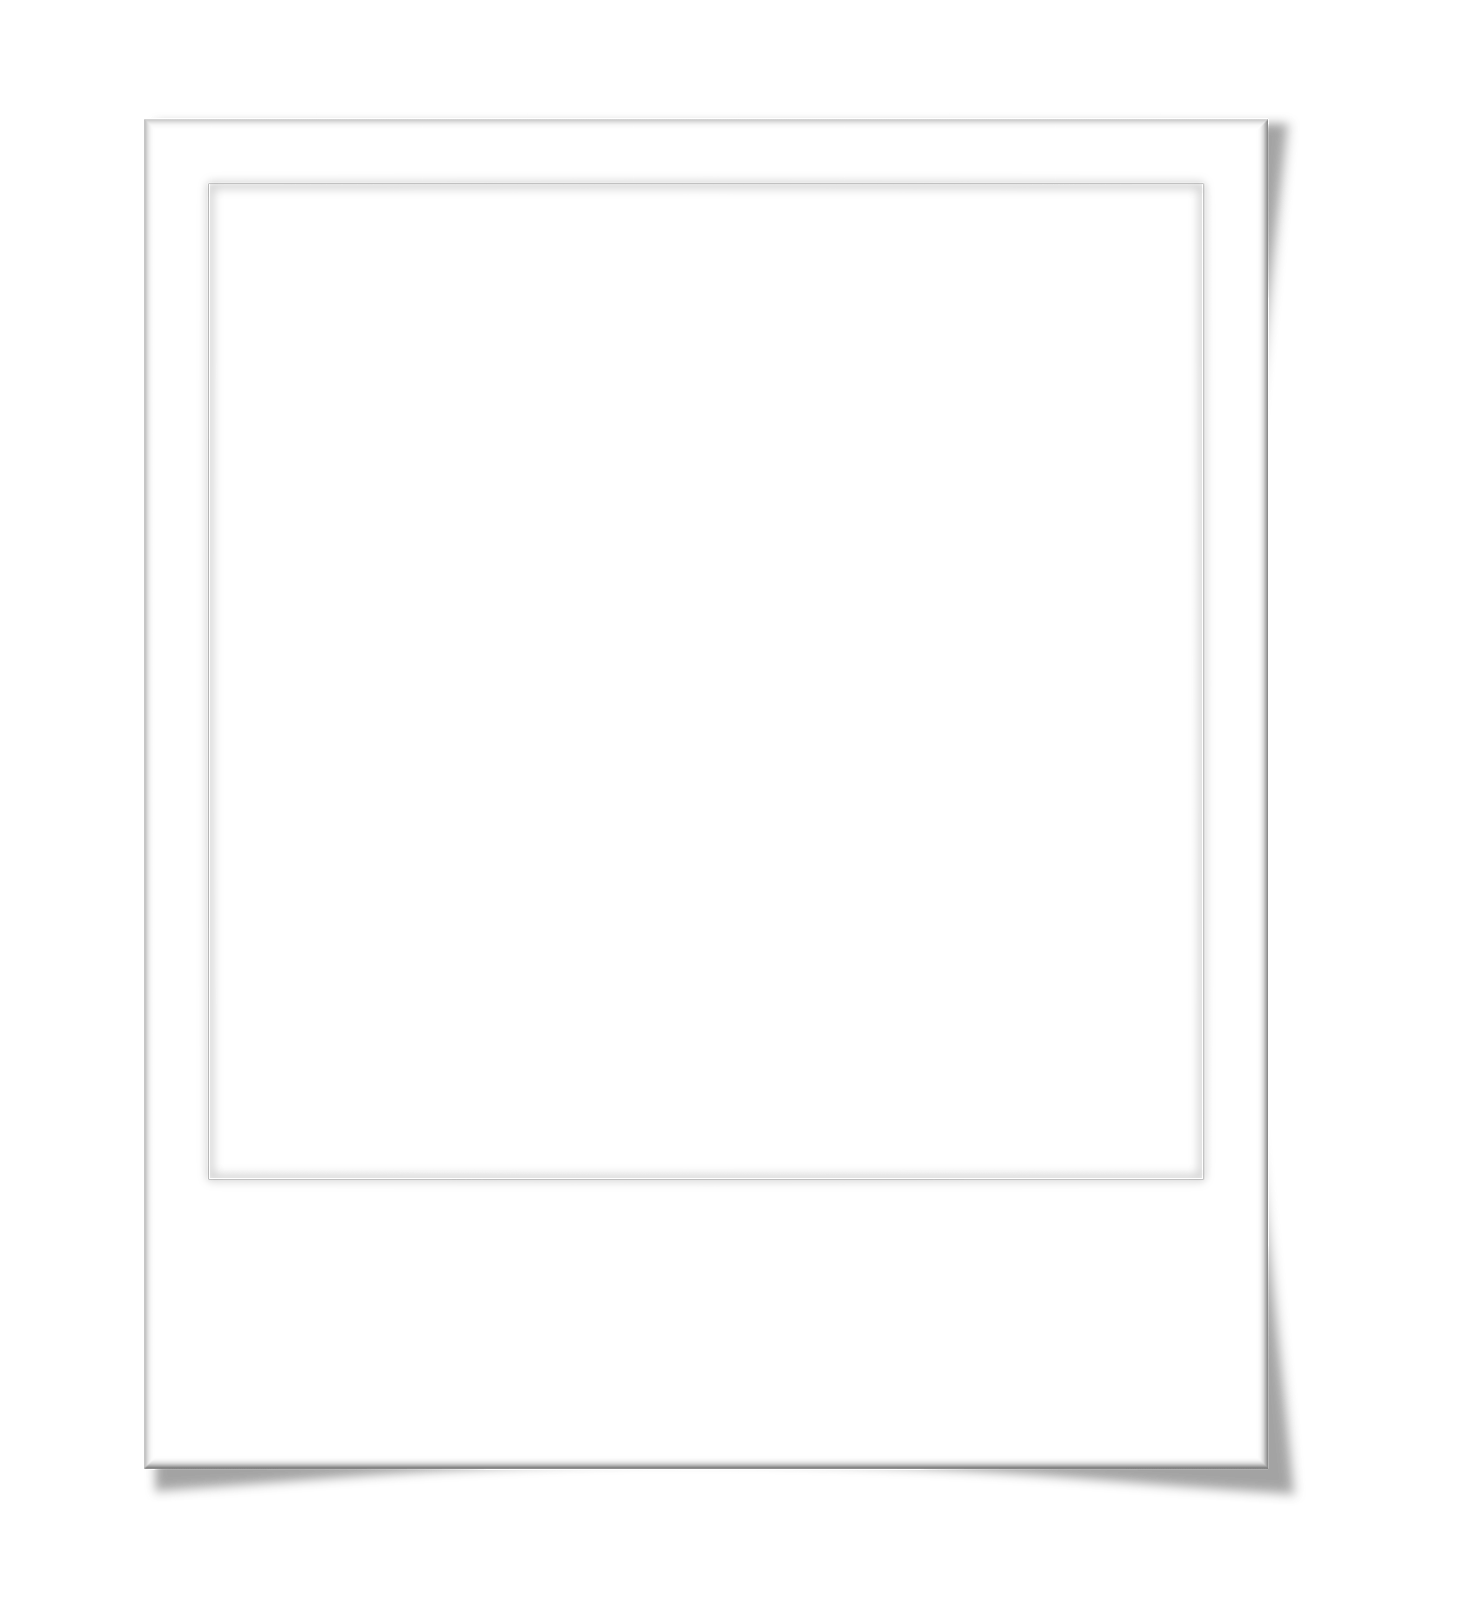 blank polaroid background - HD1477×1600